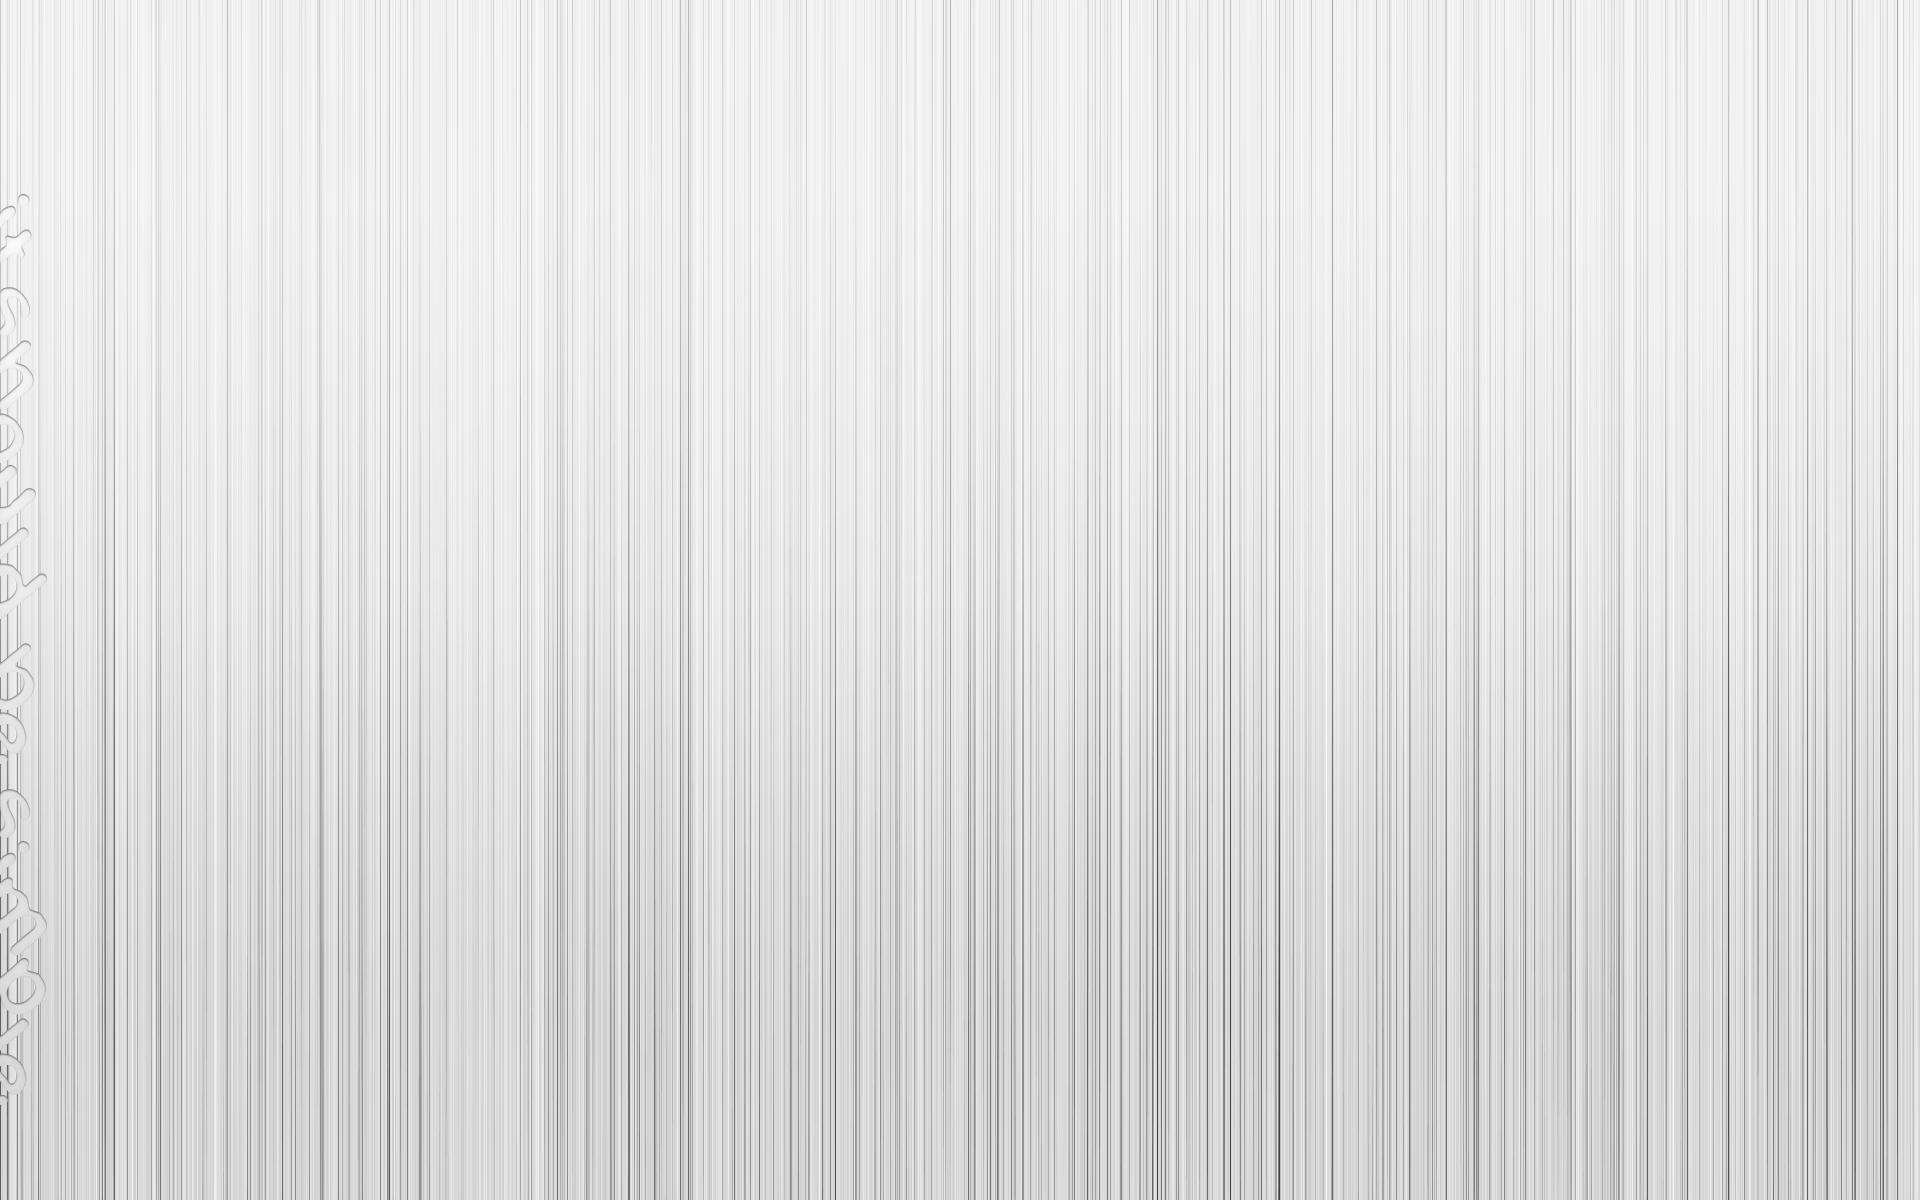 47 Simple Wallpaper Backgrounds For Your Desktop 1920x1200